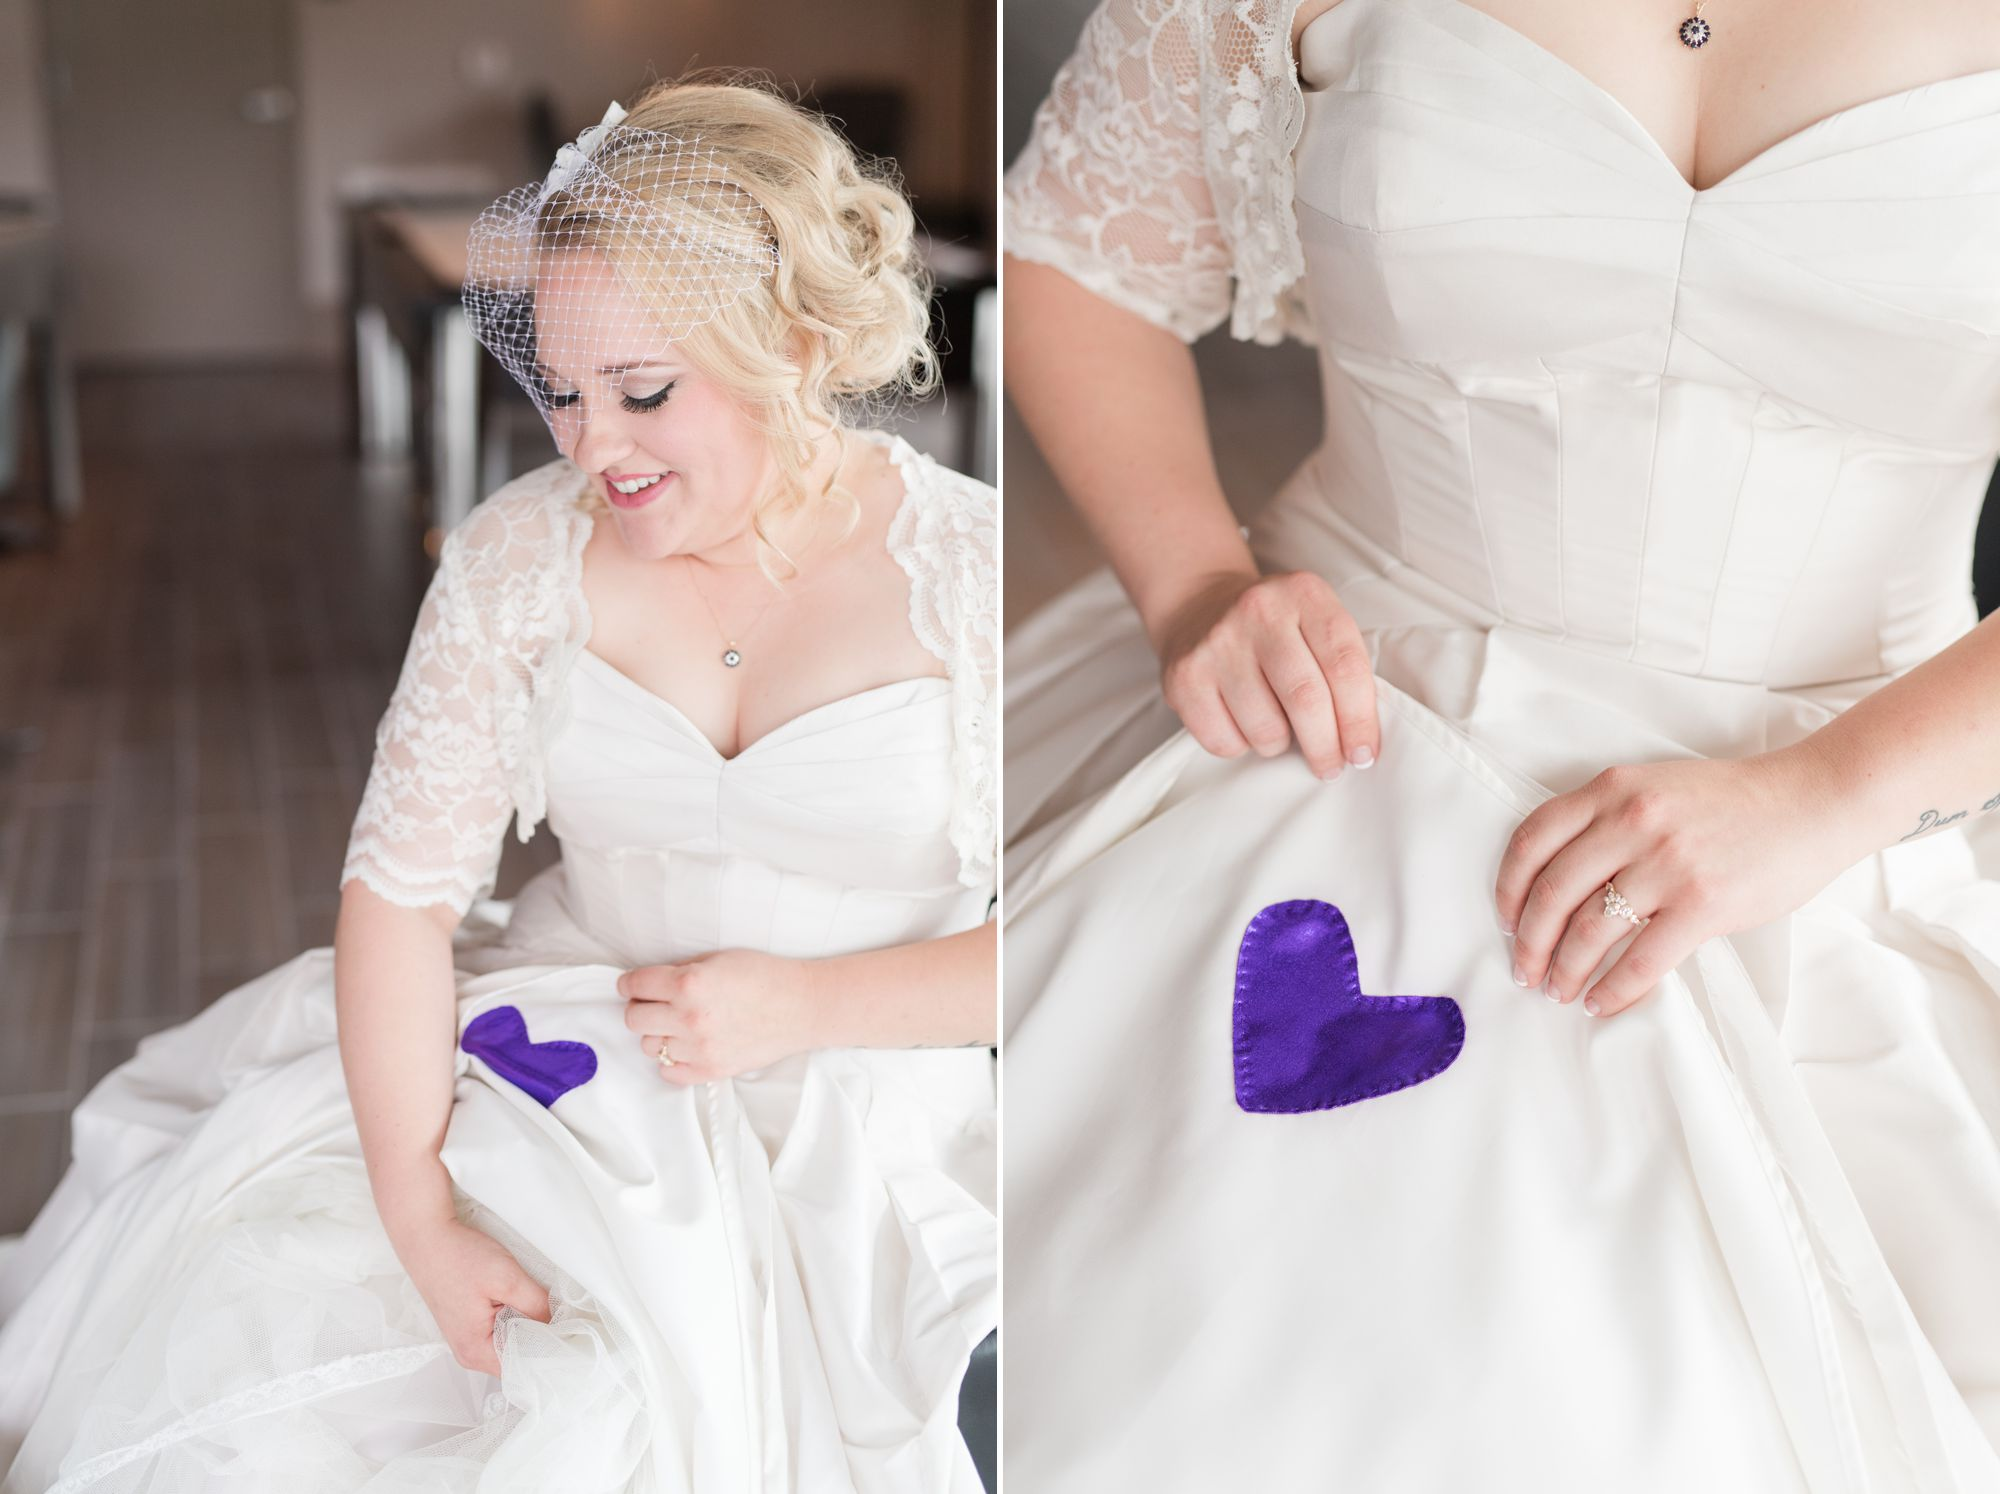 uptown-charlotte-warhouse-wedding-16.jpg